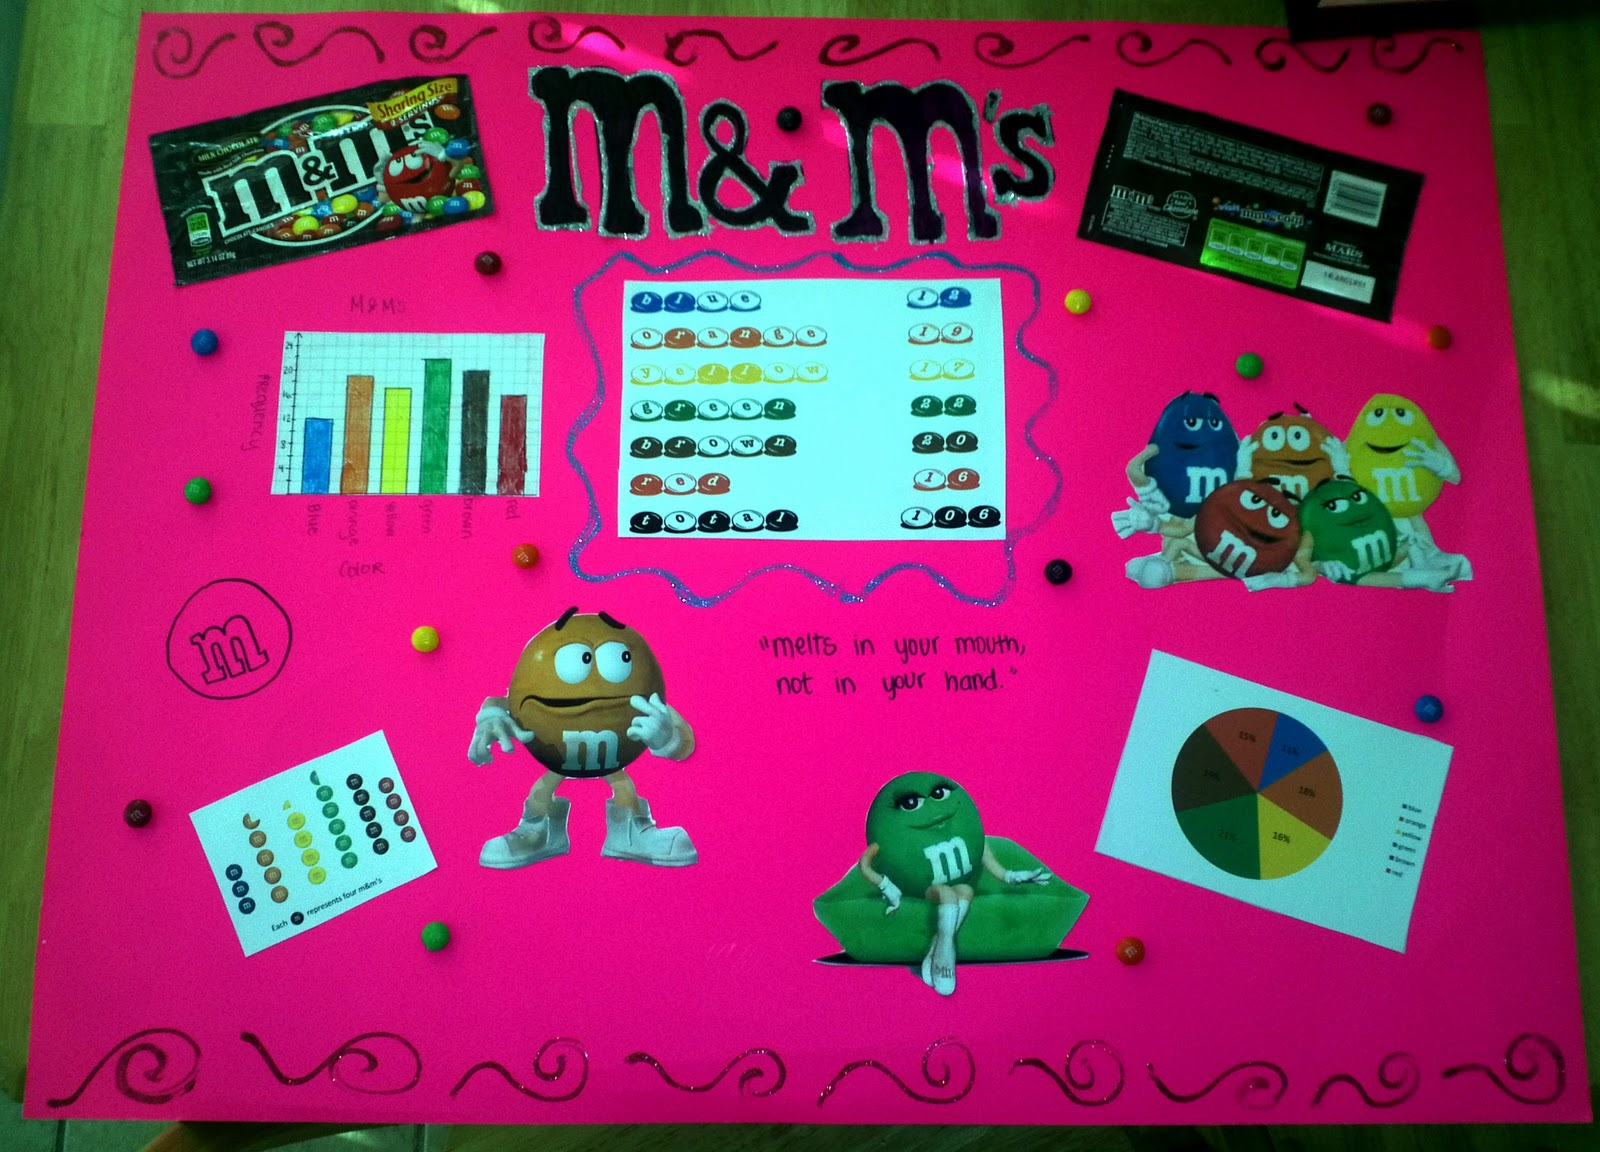 8th grade math mission ideas